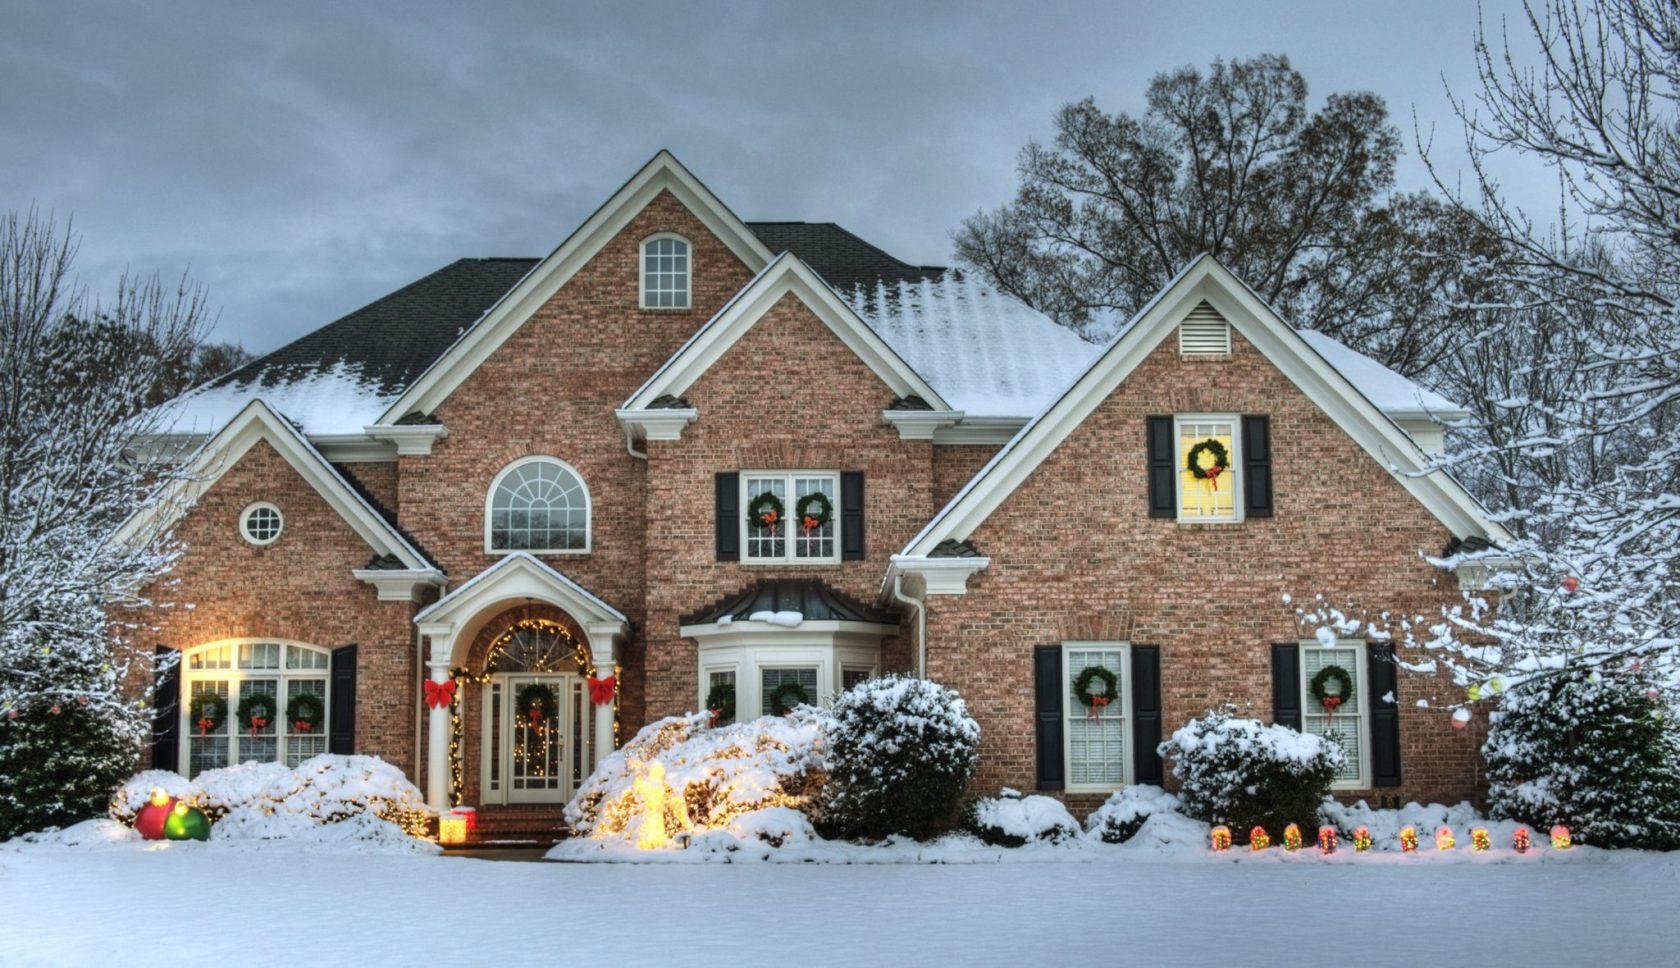 new-year-house-improvements-for-burlington-homes-team-logue